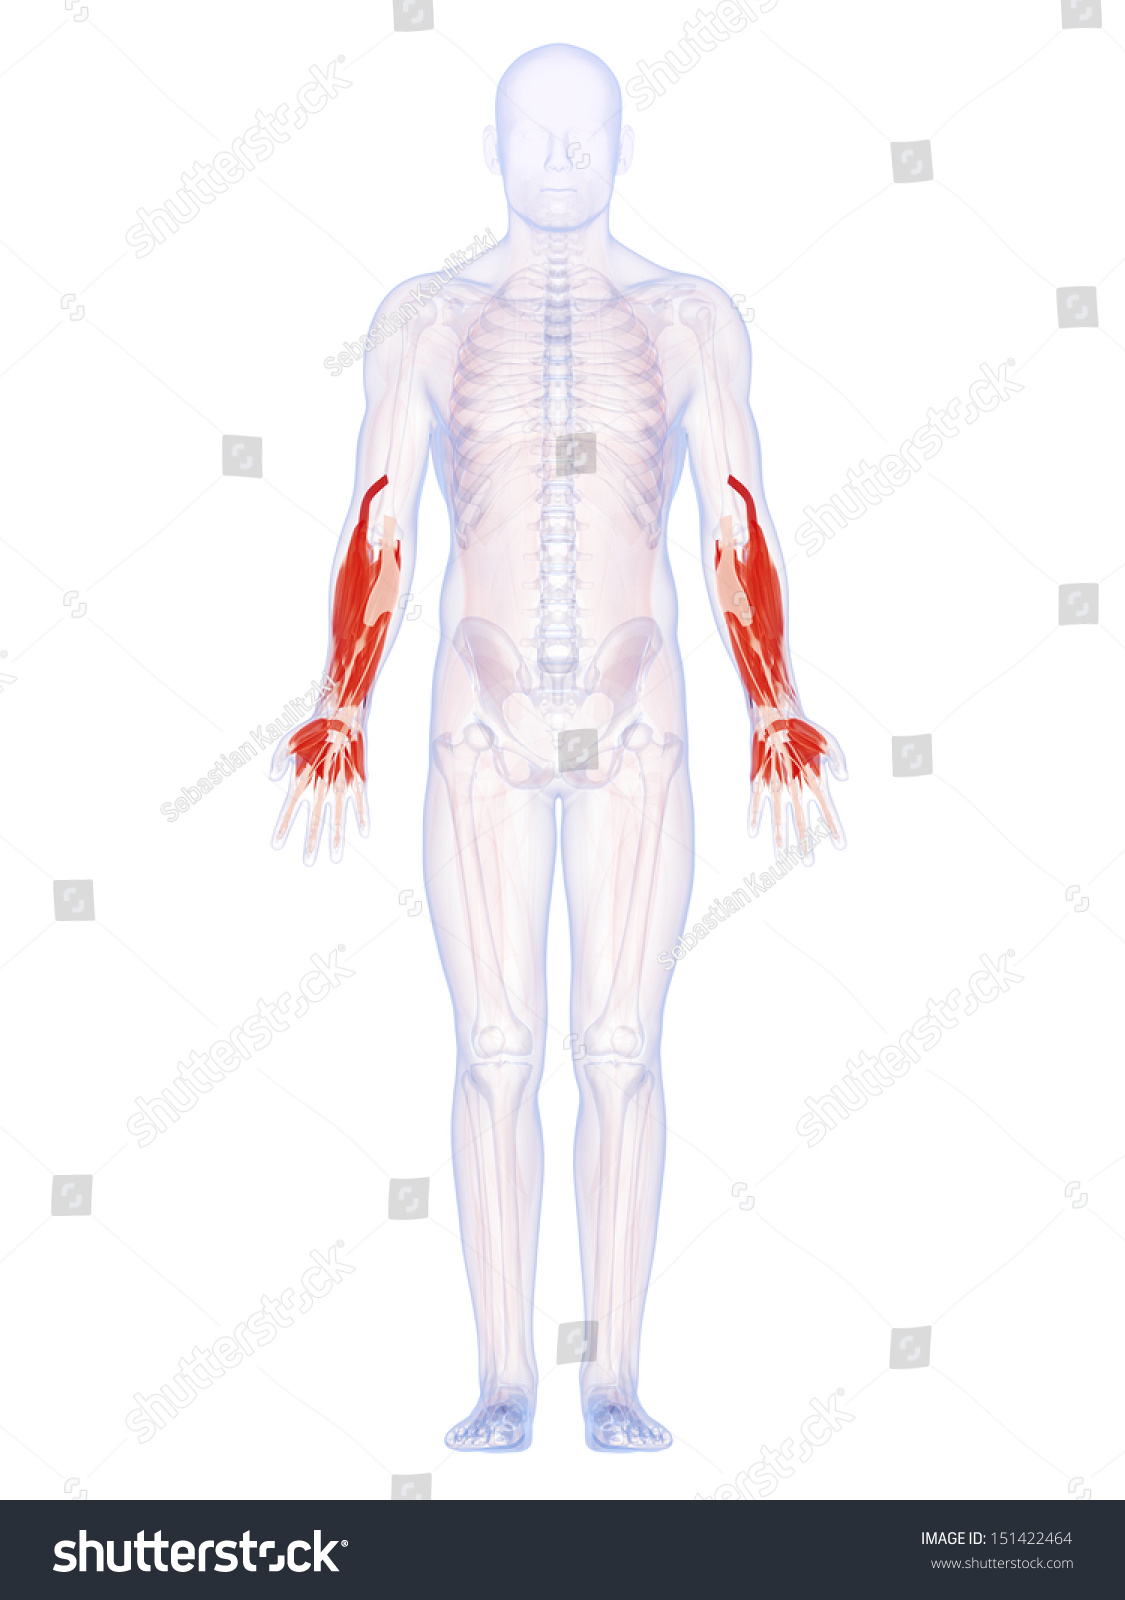 3 D Rendered Illustration Lower Arm Muscles Stock Illustration ...